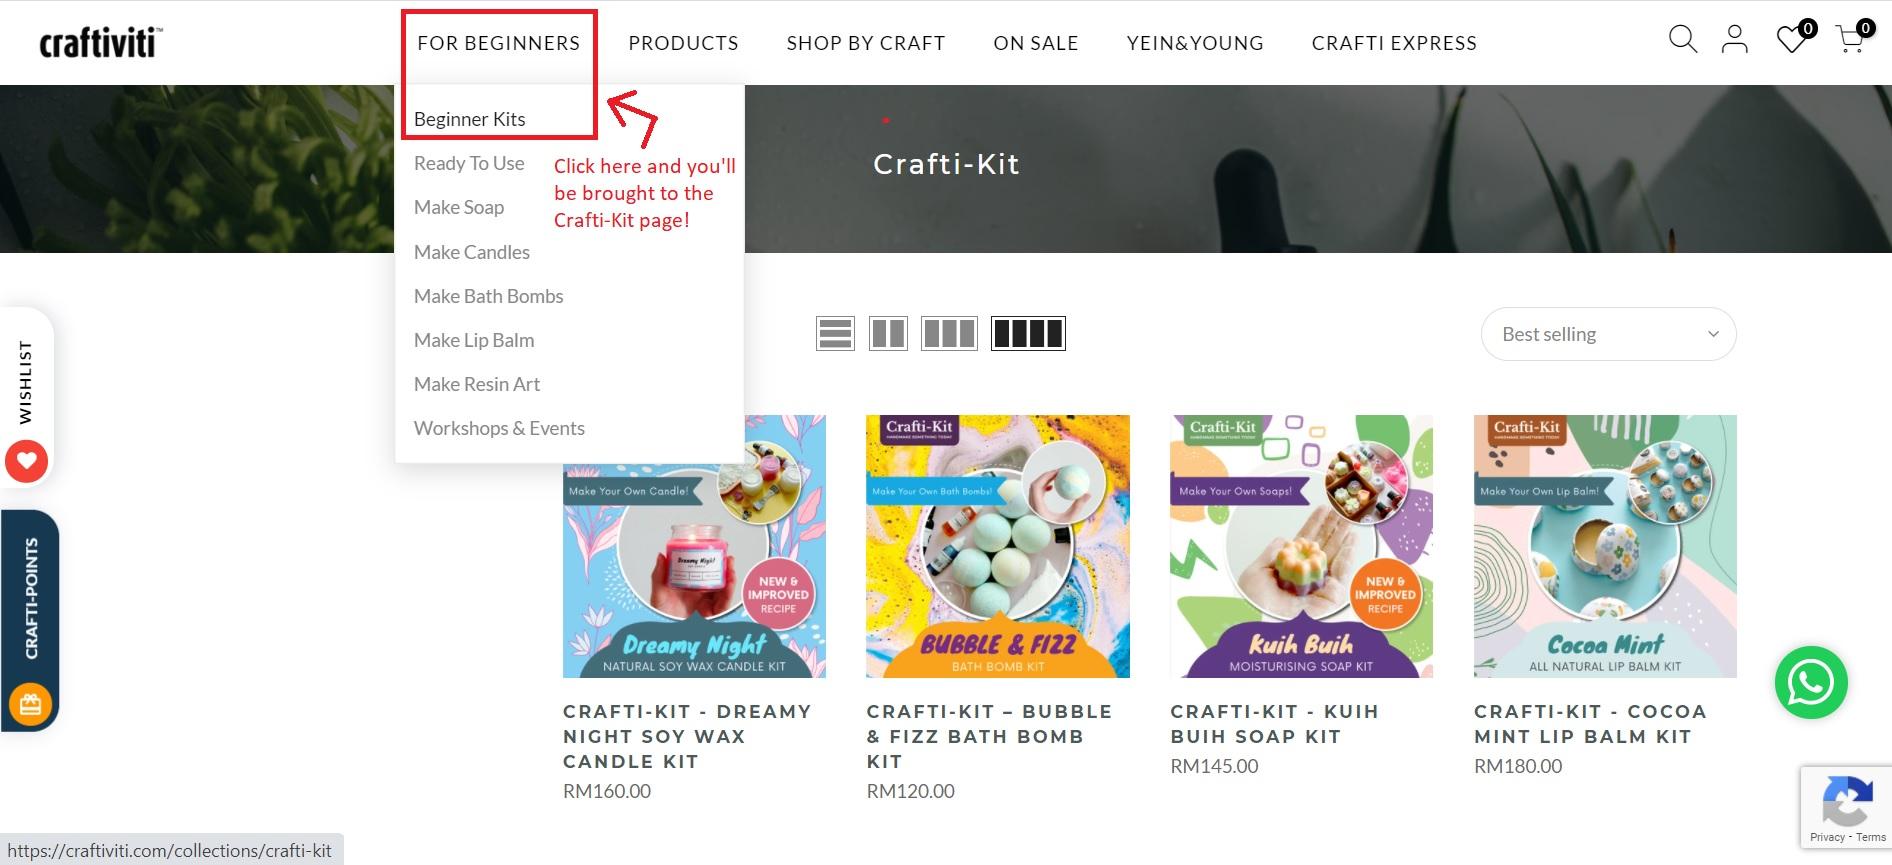 crafti kit website craftiviti collection